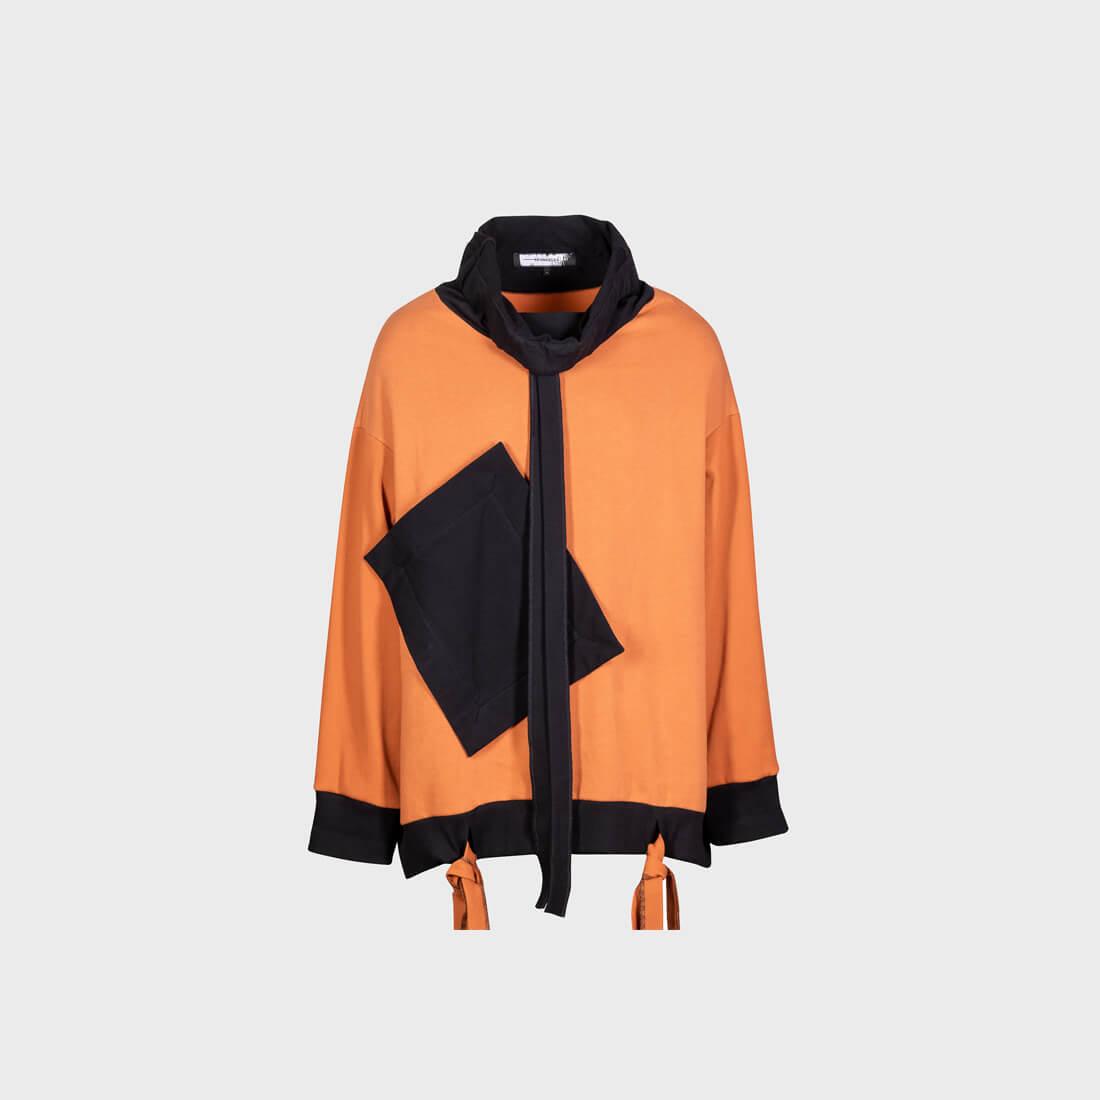 SOSNOVSKA Shifted Pocket Sweater